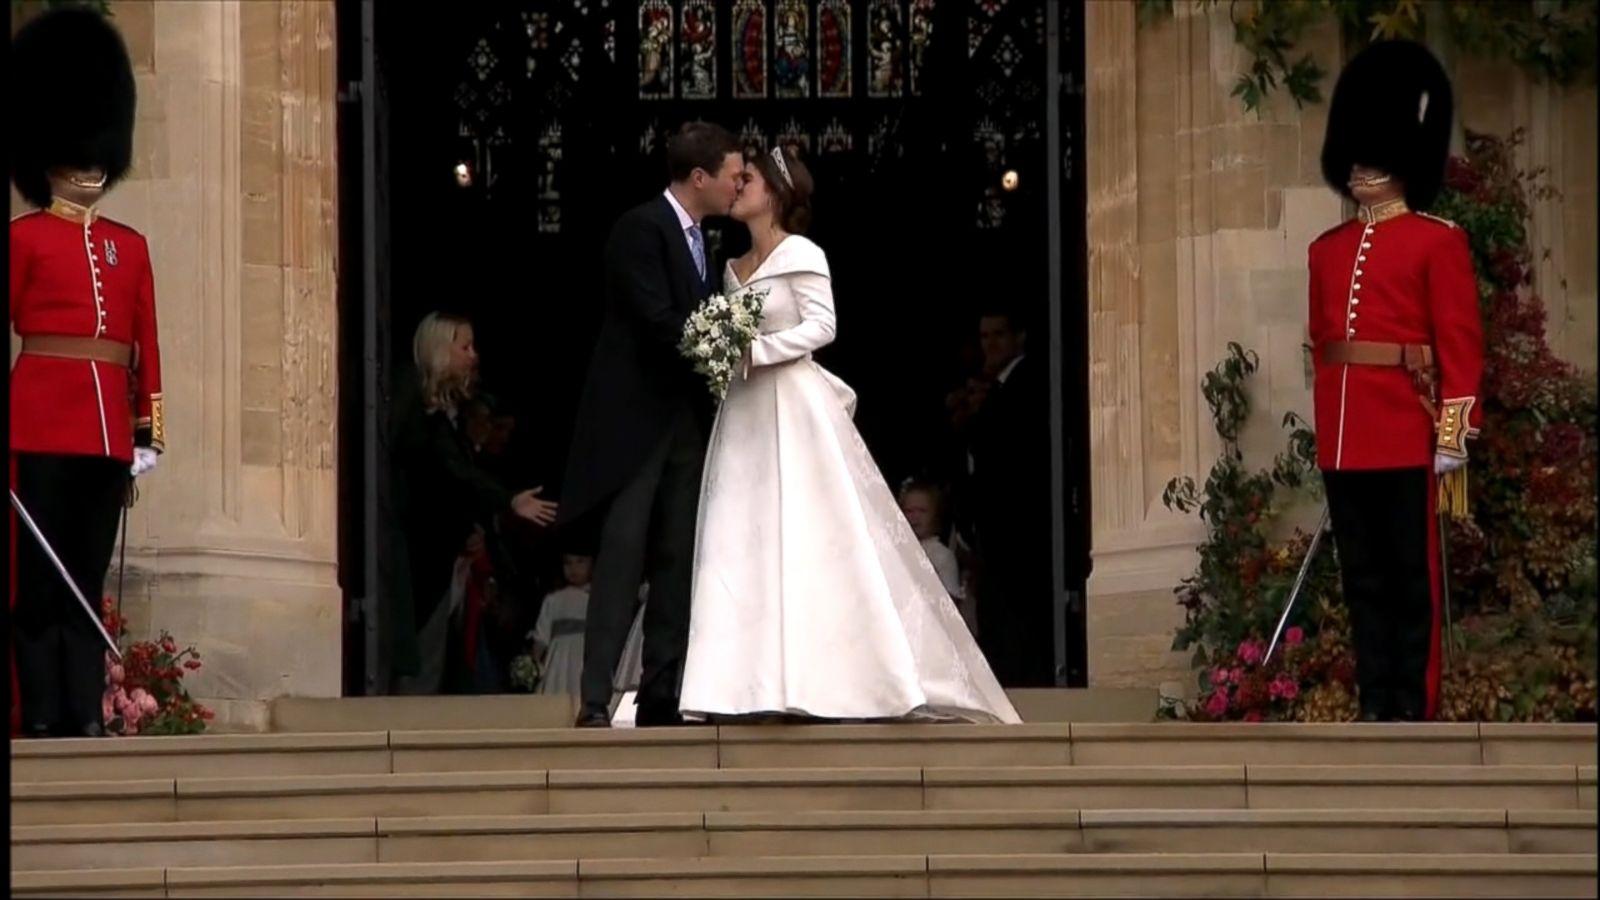 Princess Eugenie Weds Jack Brooksbank In Same Chapel Where Prince